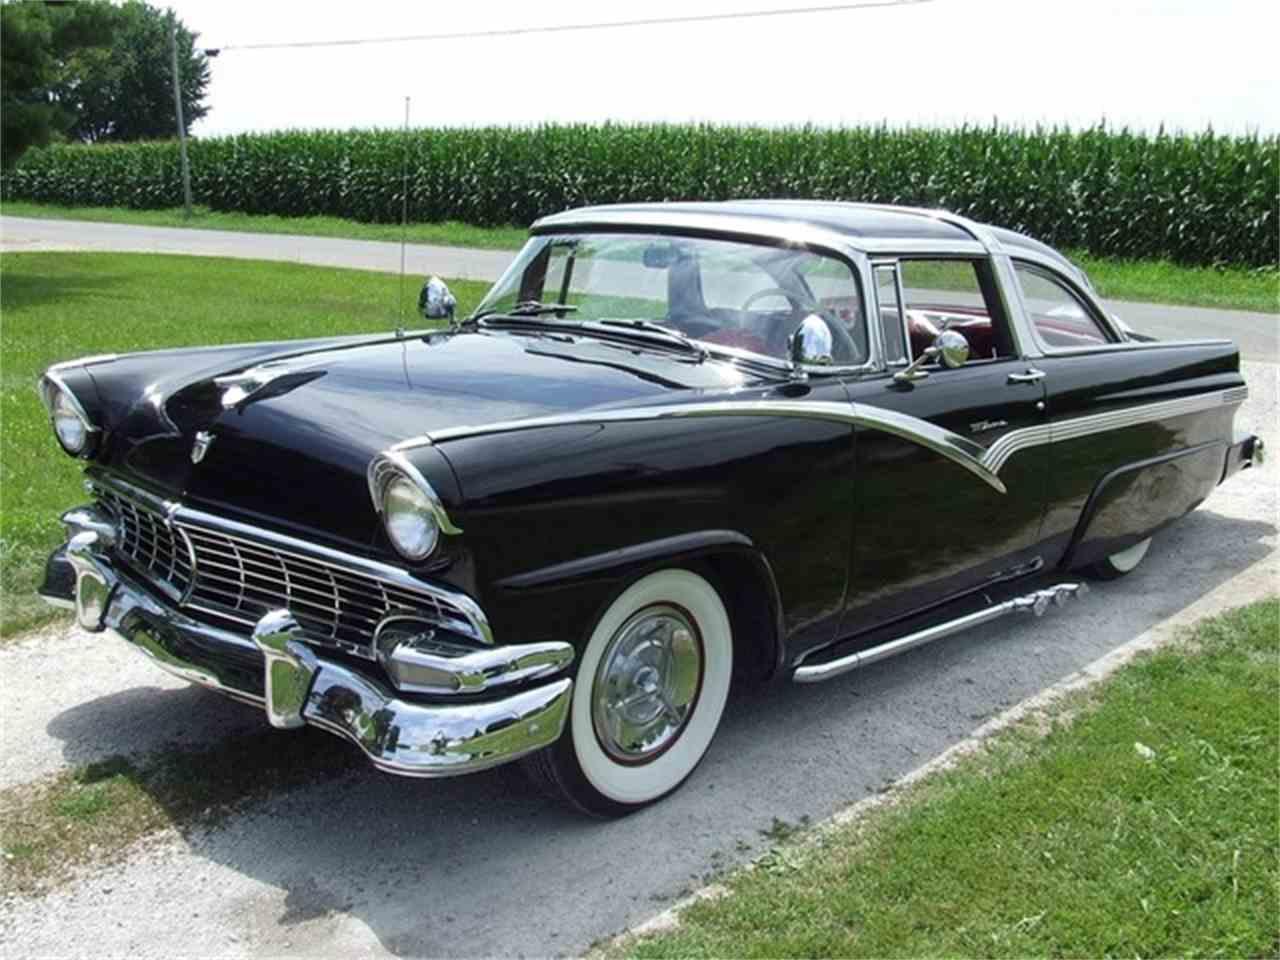 1956 ford crown victoria for sale cc 559818. Black Bedroom Furniture Sets. Home Design Ideas